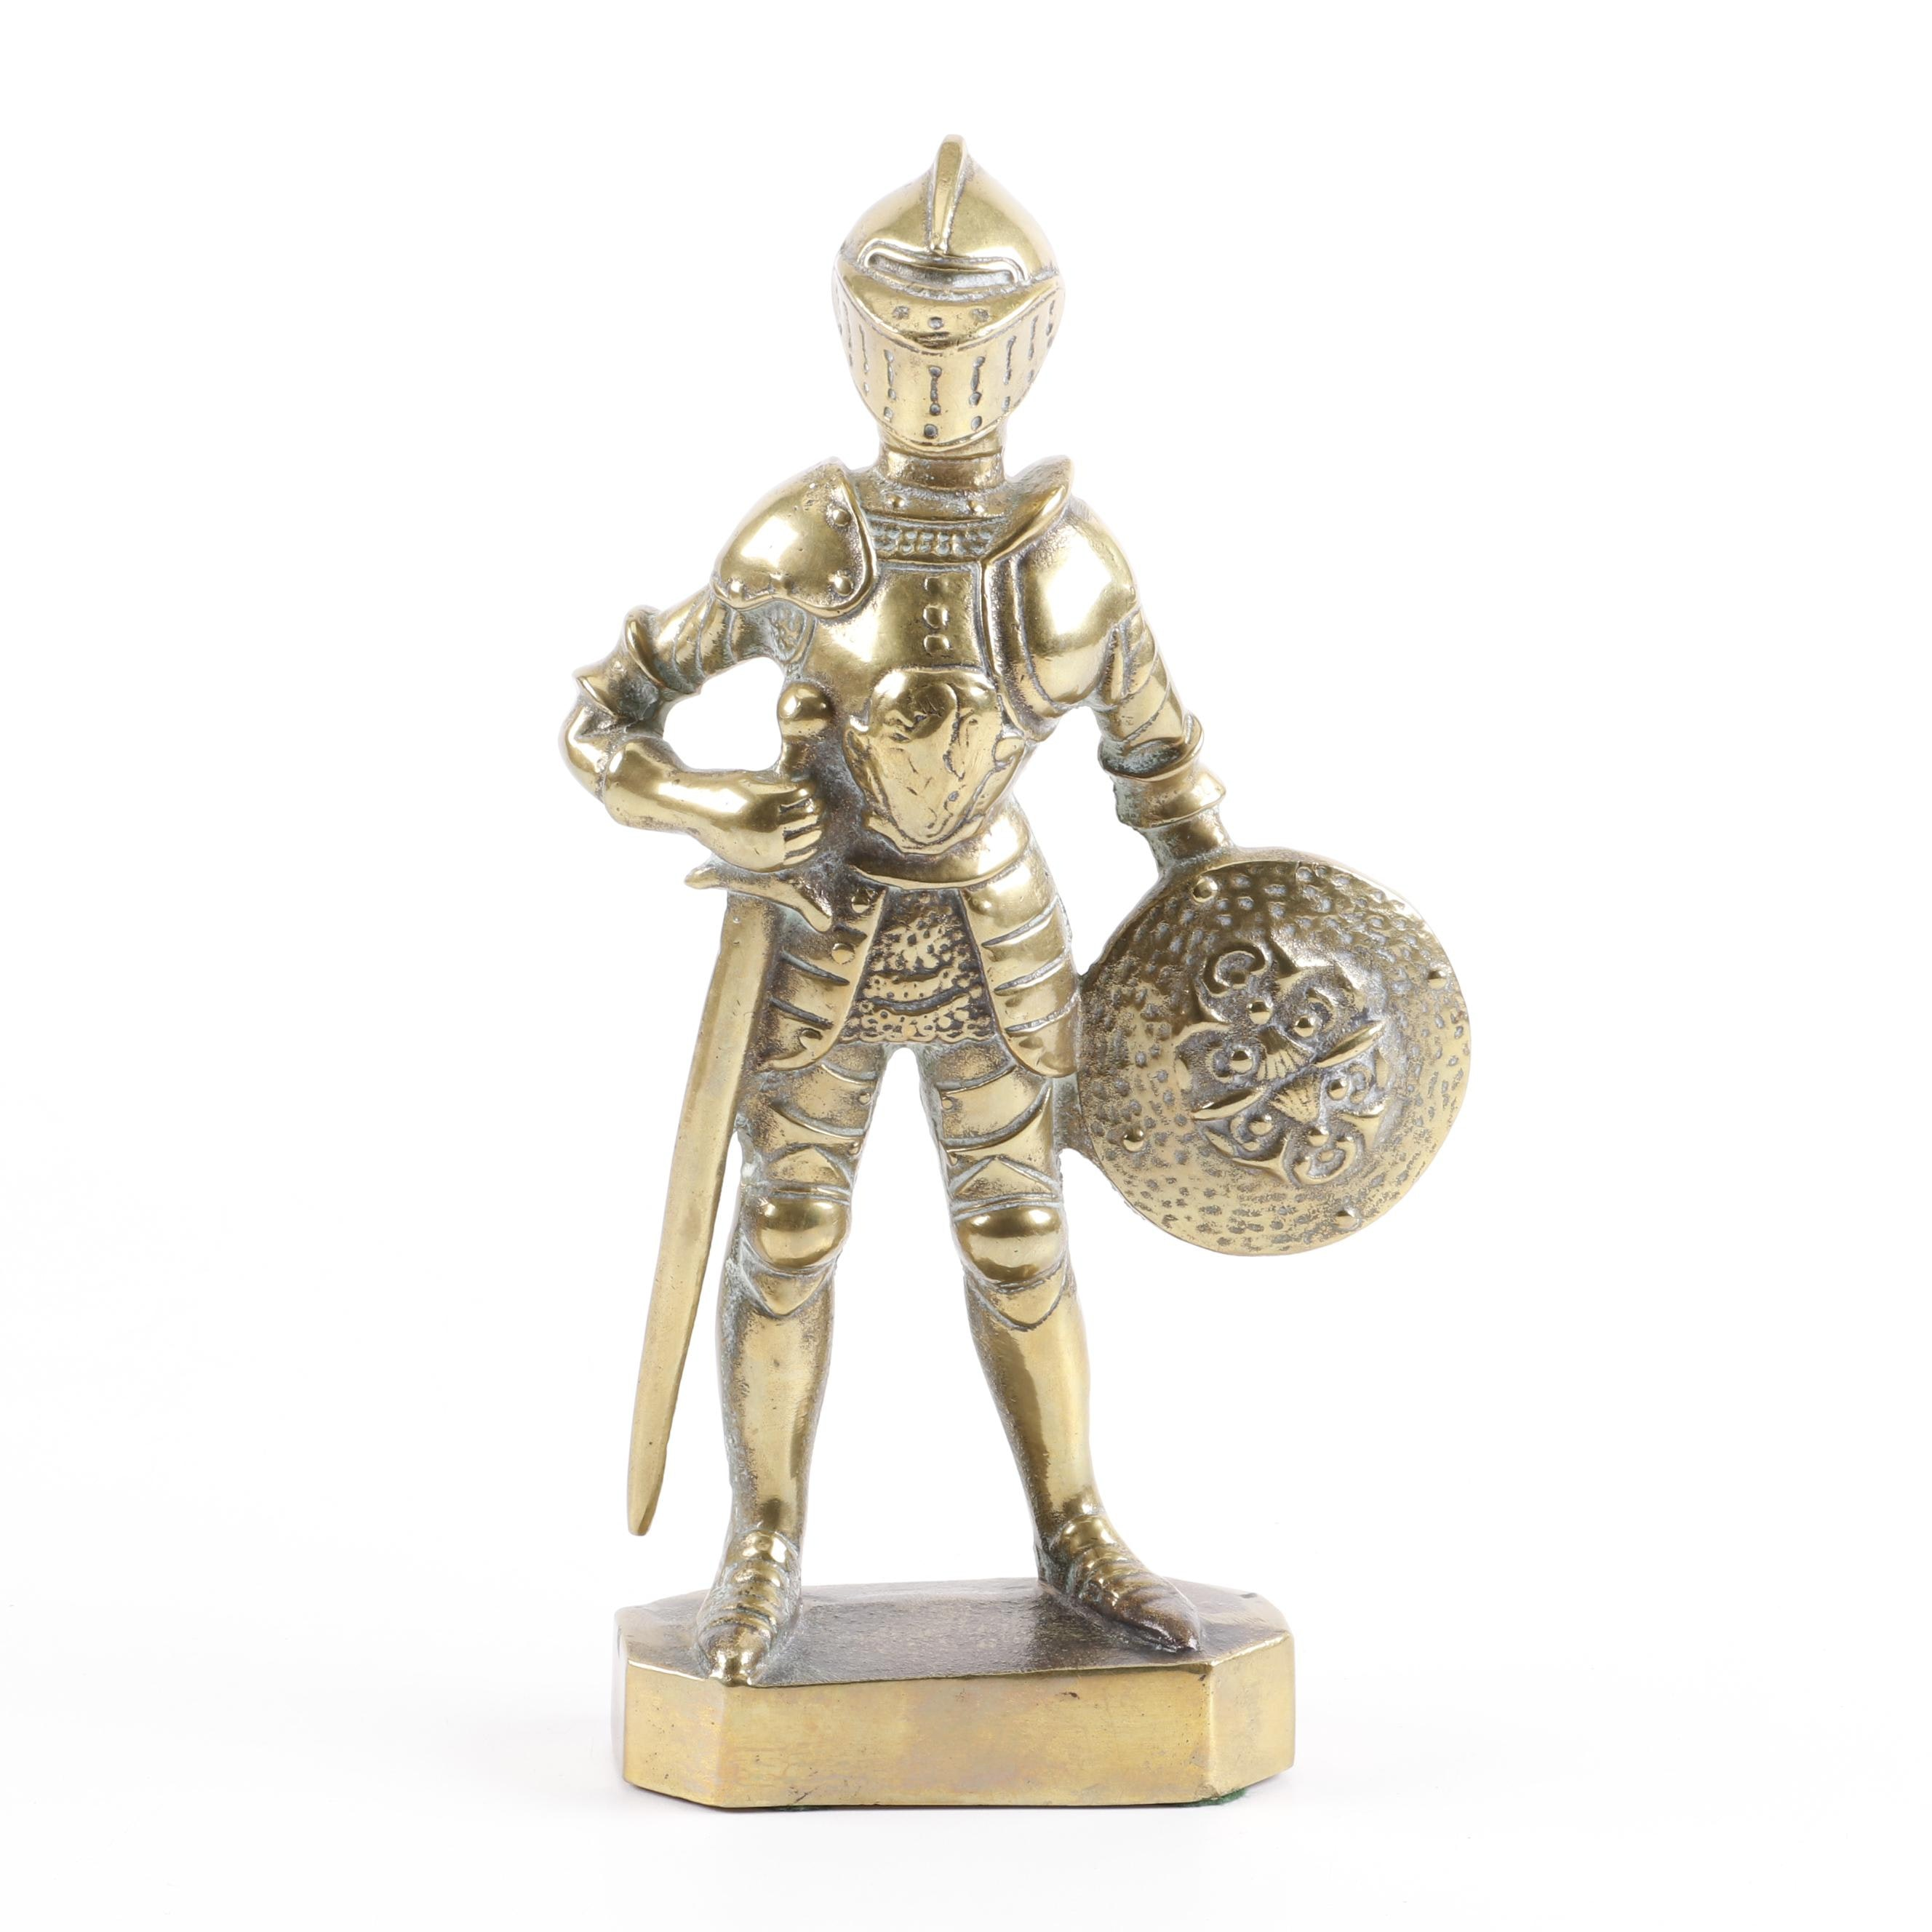 Cast Brass Figure of a Knight